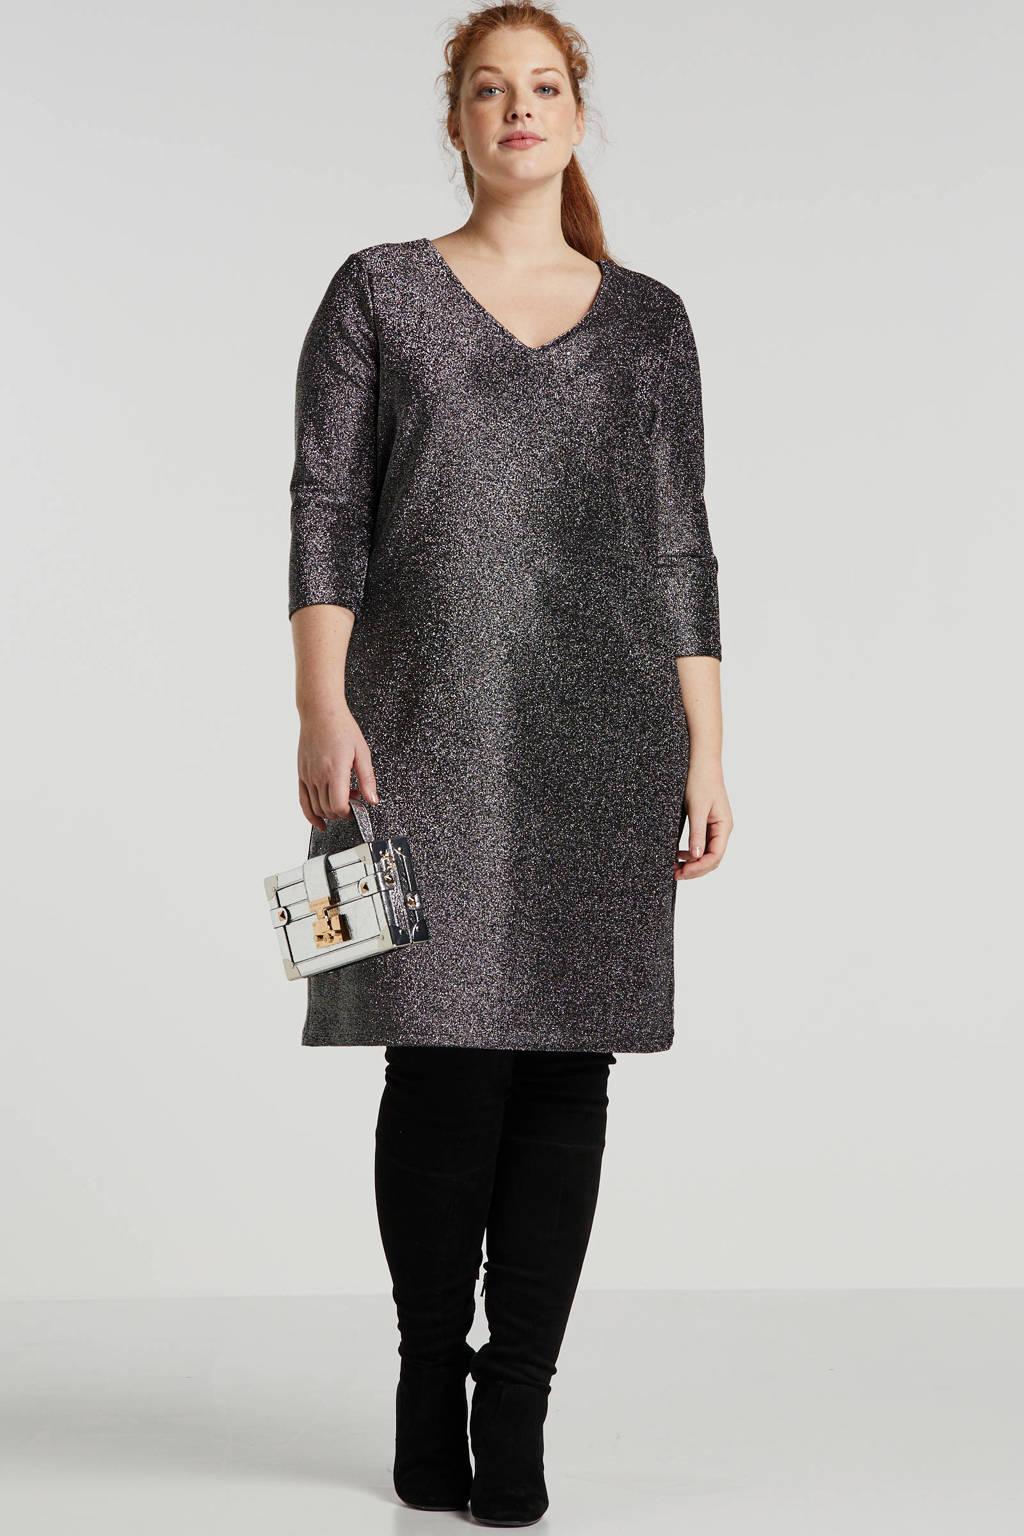 JUNAROSE jurk met open detail zwart, Zwart